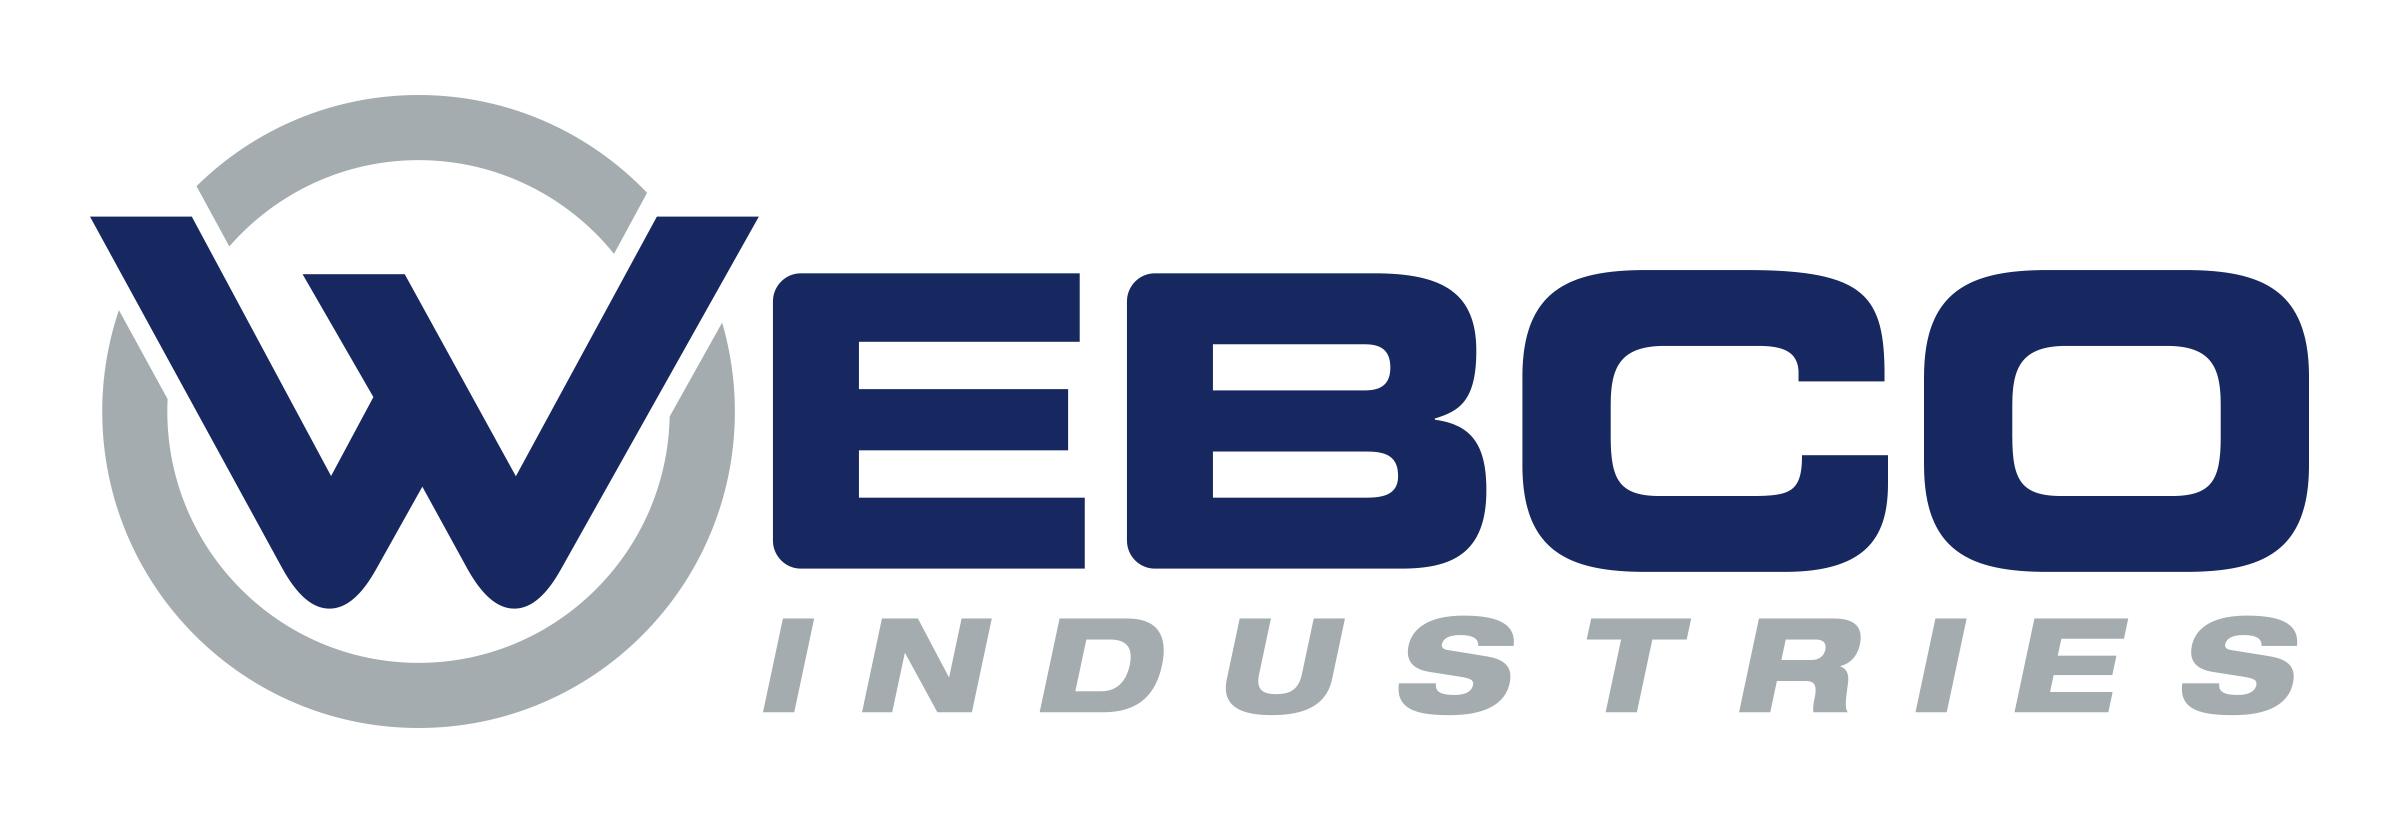 Webco Industries, Inc. logo